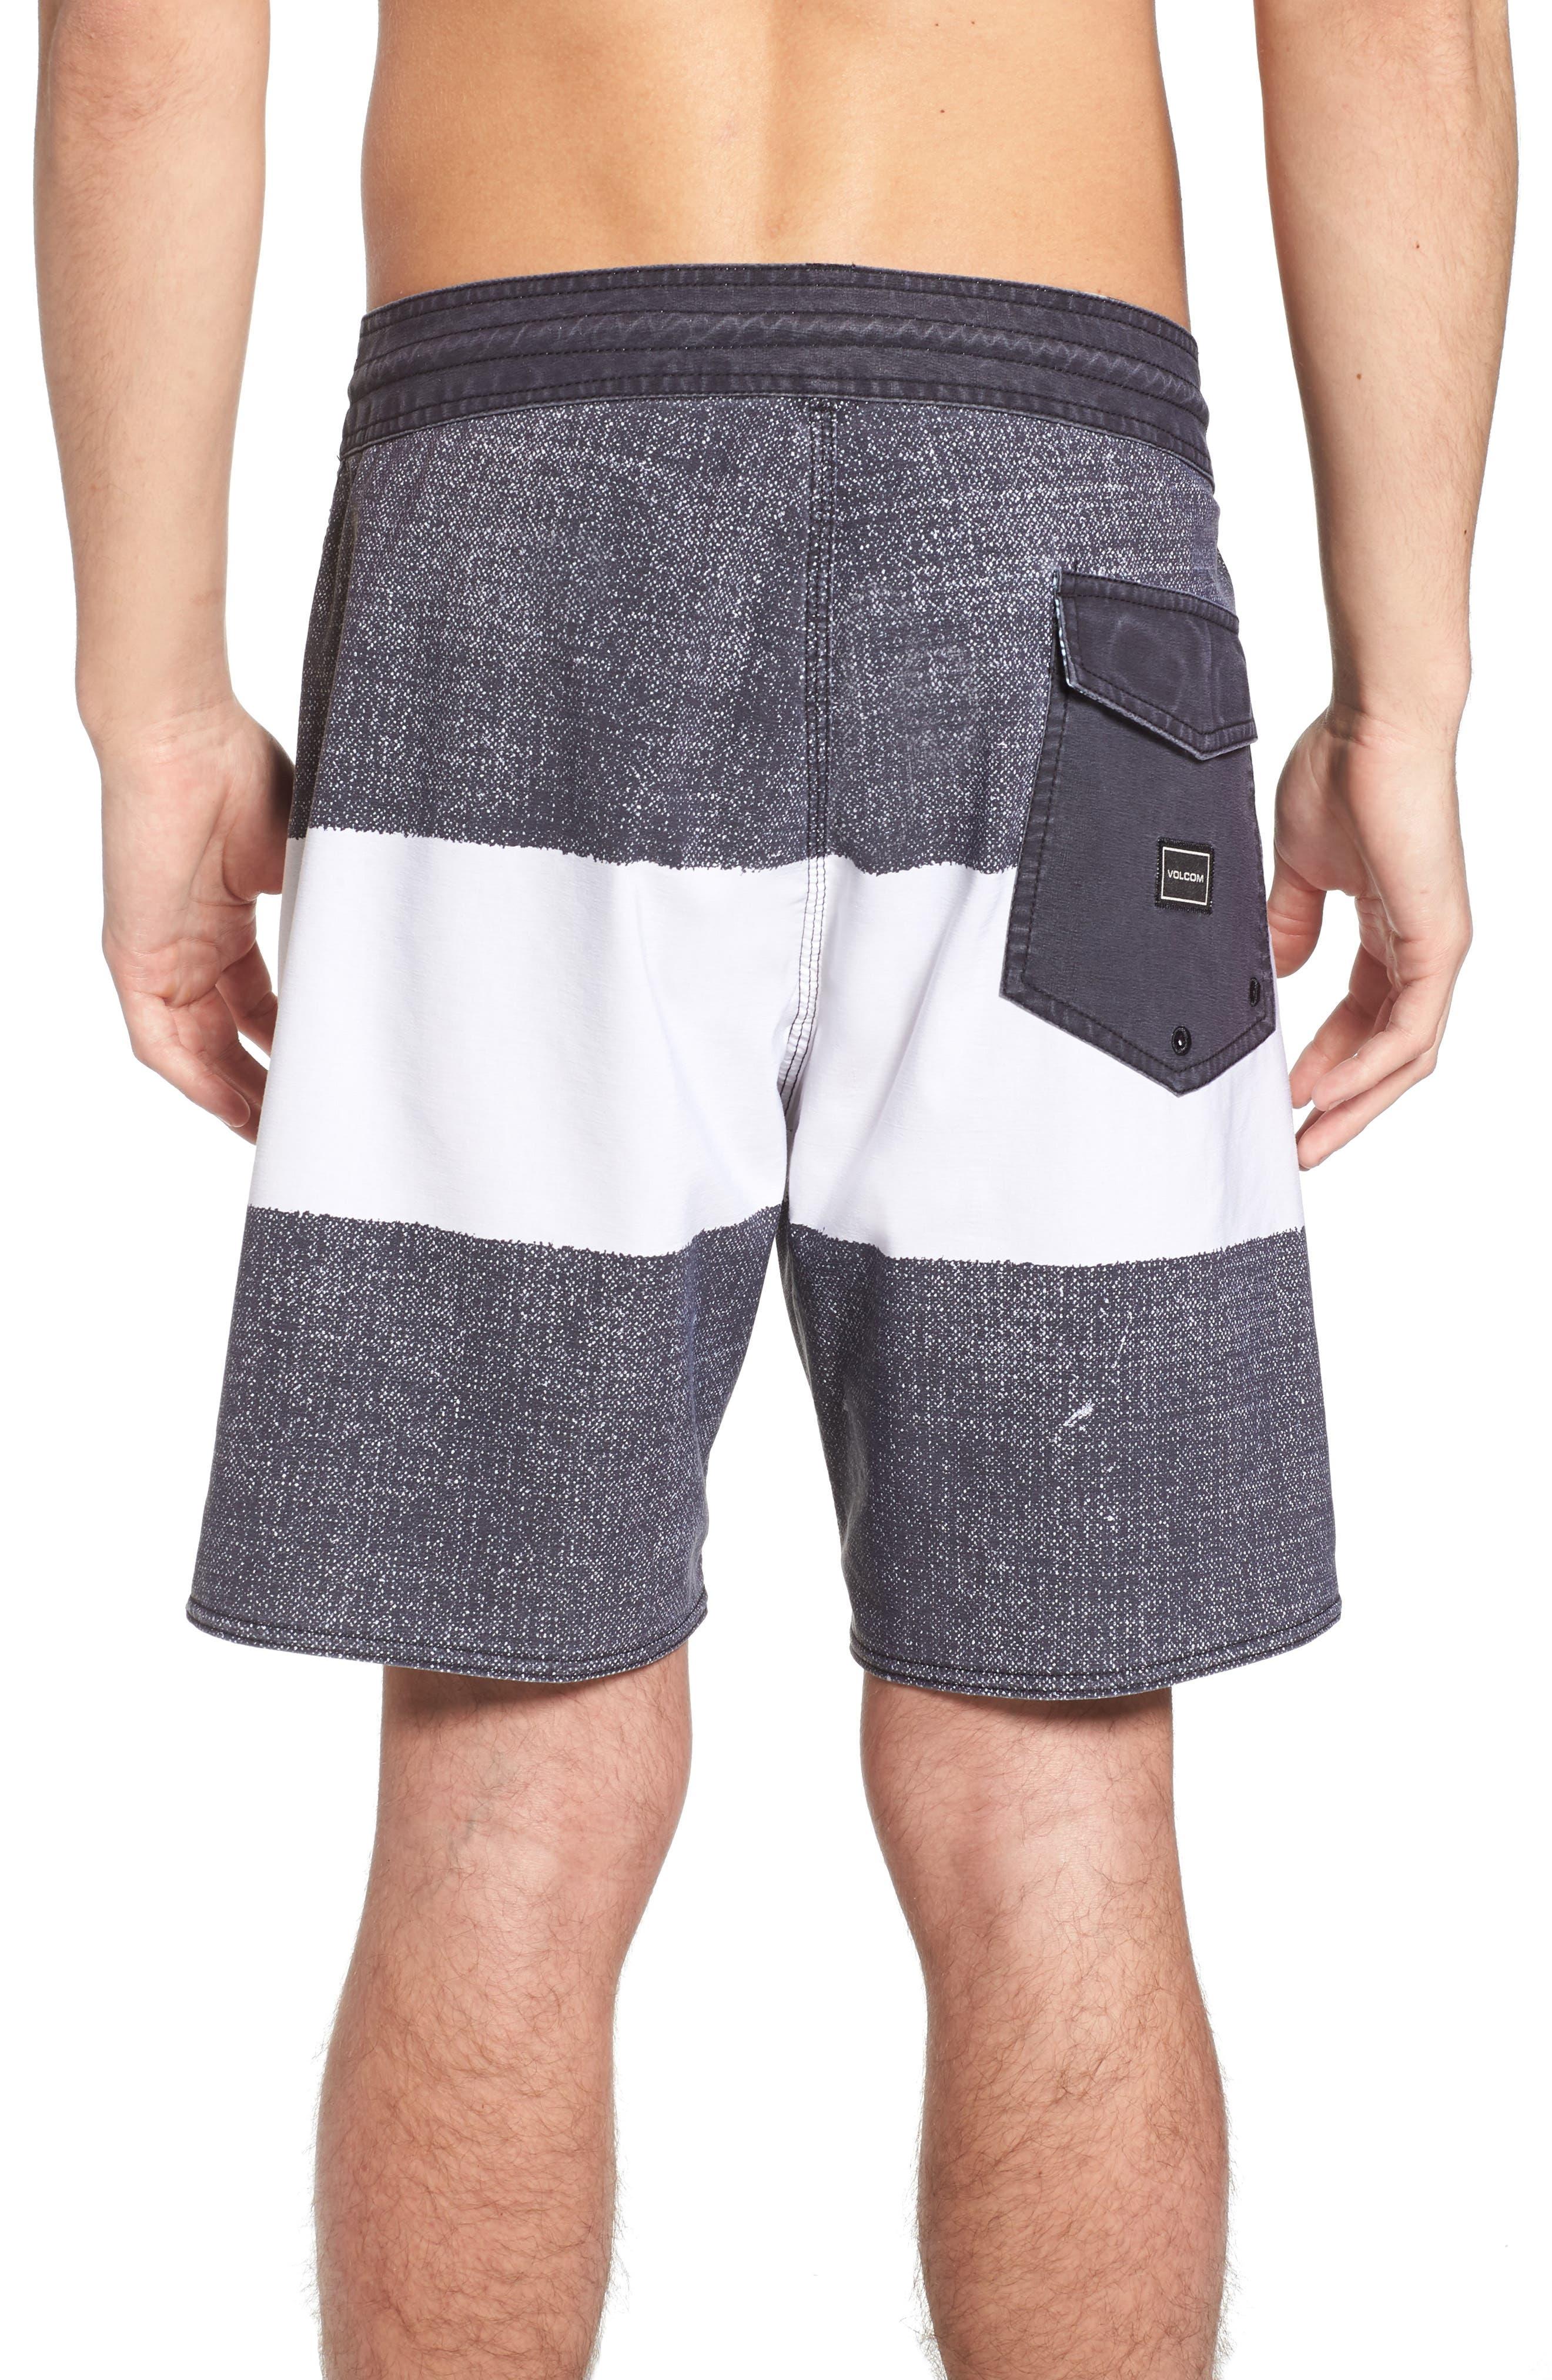 Balbroa Stoney Board Shorts,                             Alternate thumbnail 2, color,                             Stealth